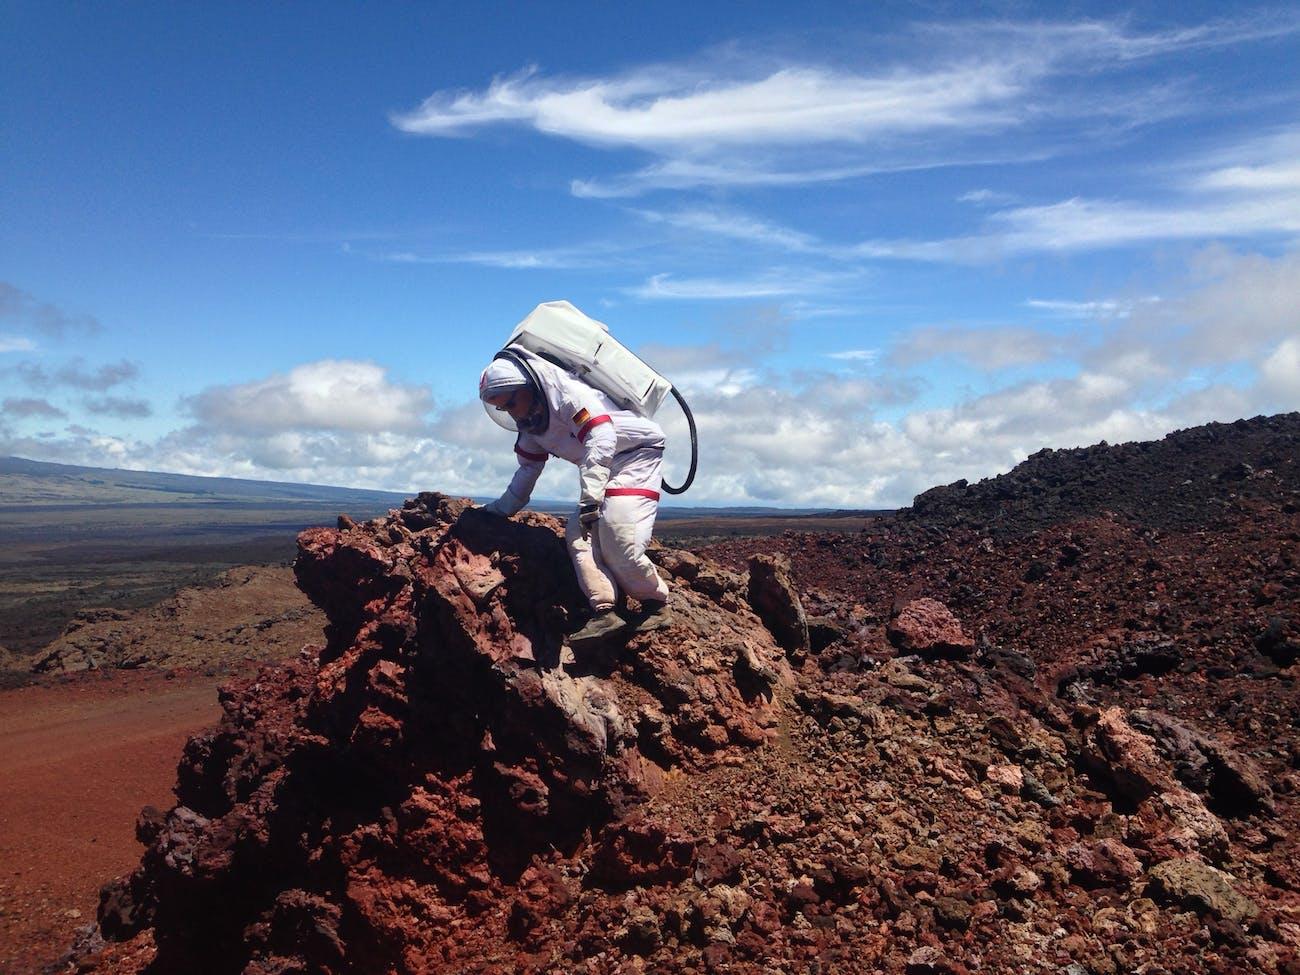 Christiane Heinicke works down a slope on an EVA mission during HI-SEAS. Carmel Johnston